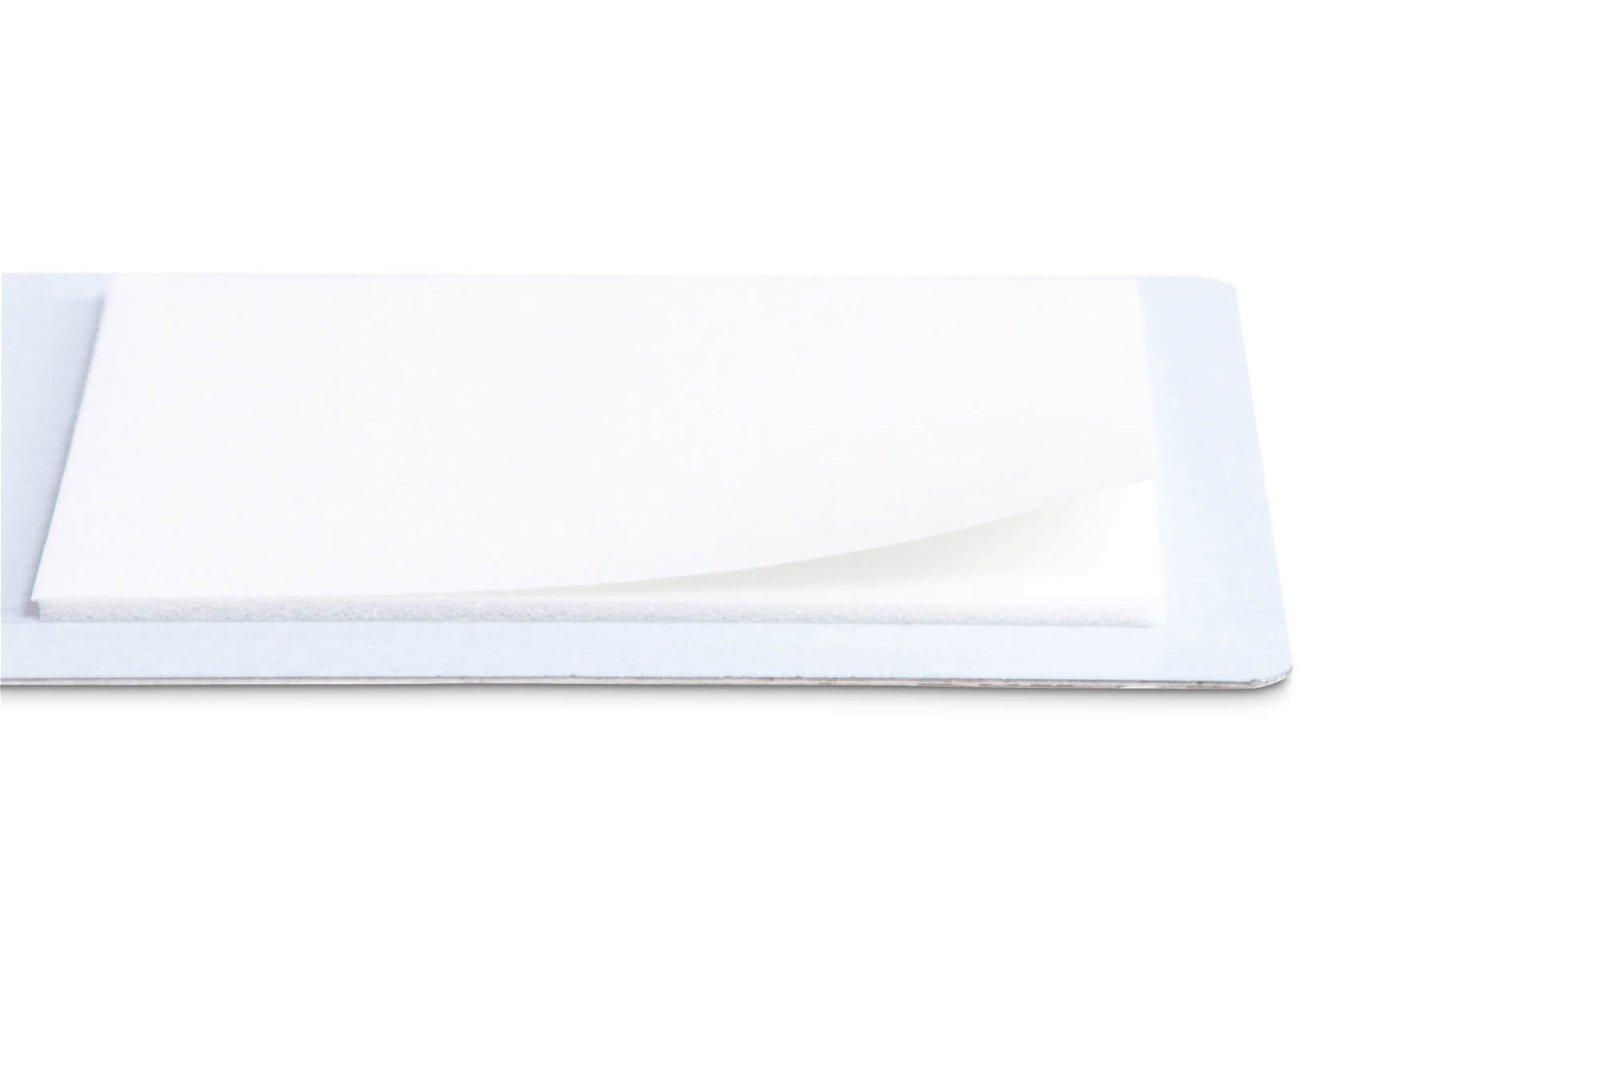 Ferroleiste MAULstandard, Länge 50 cm, inkl. 2 Magnete, weiß